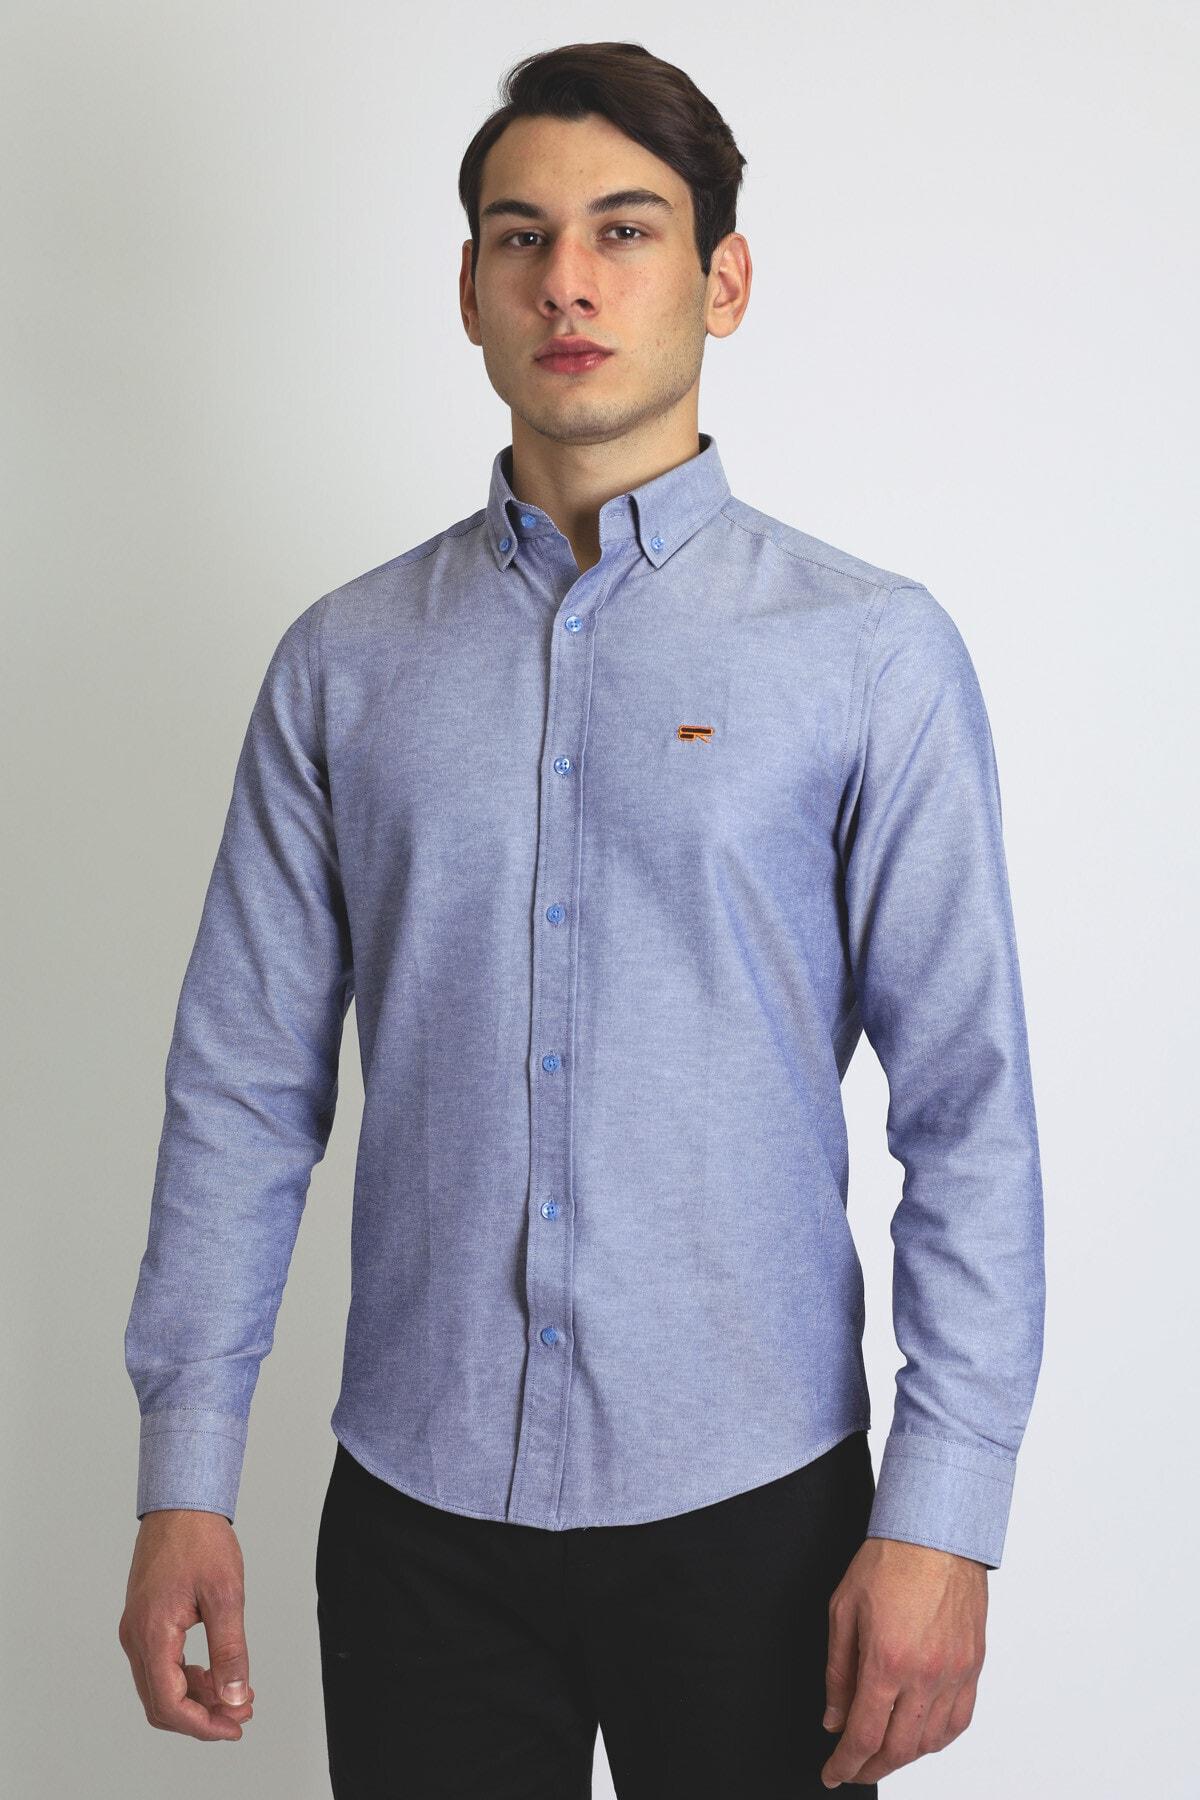 BEARRAYBON Erkek Mavi Pamuk Gömlek 1